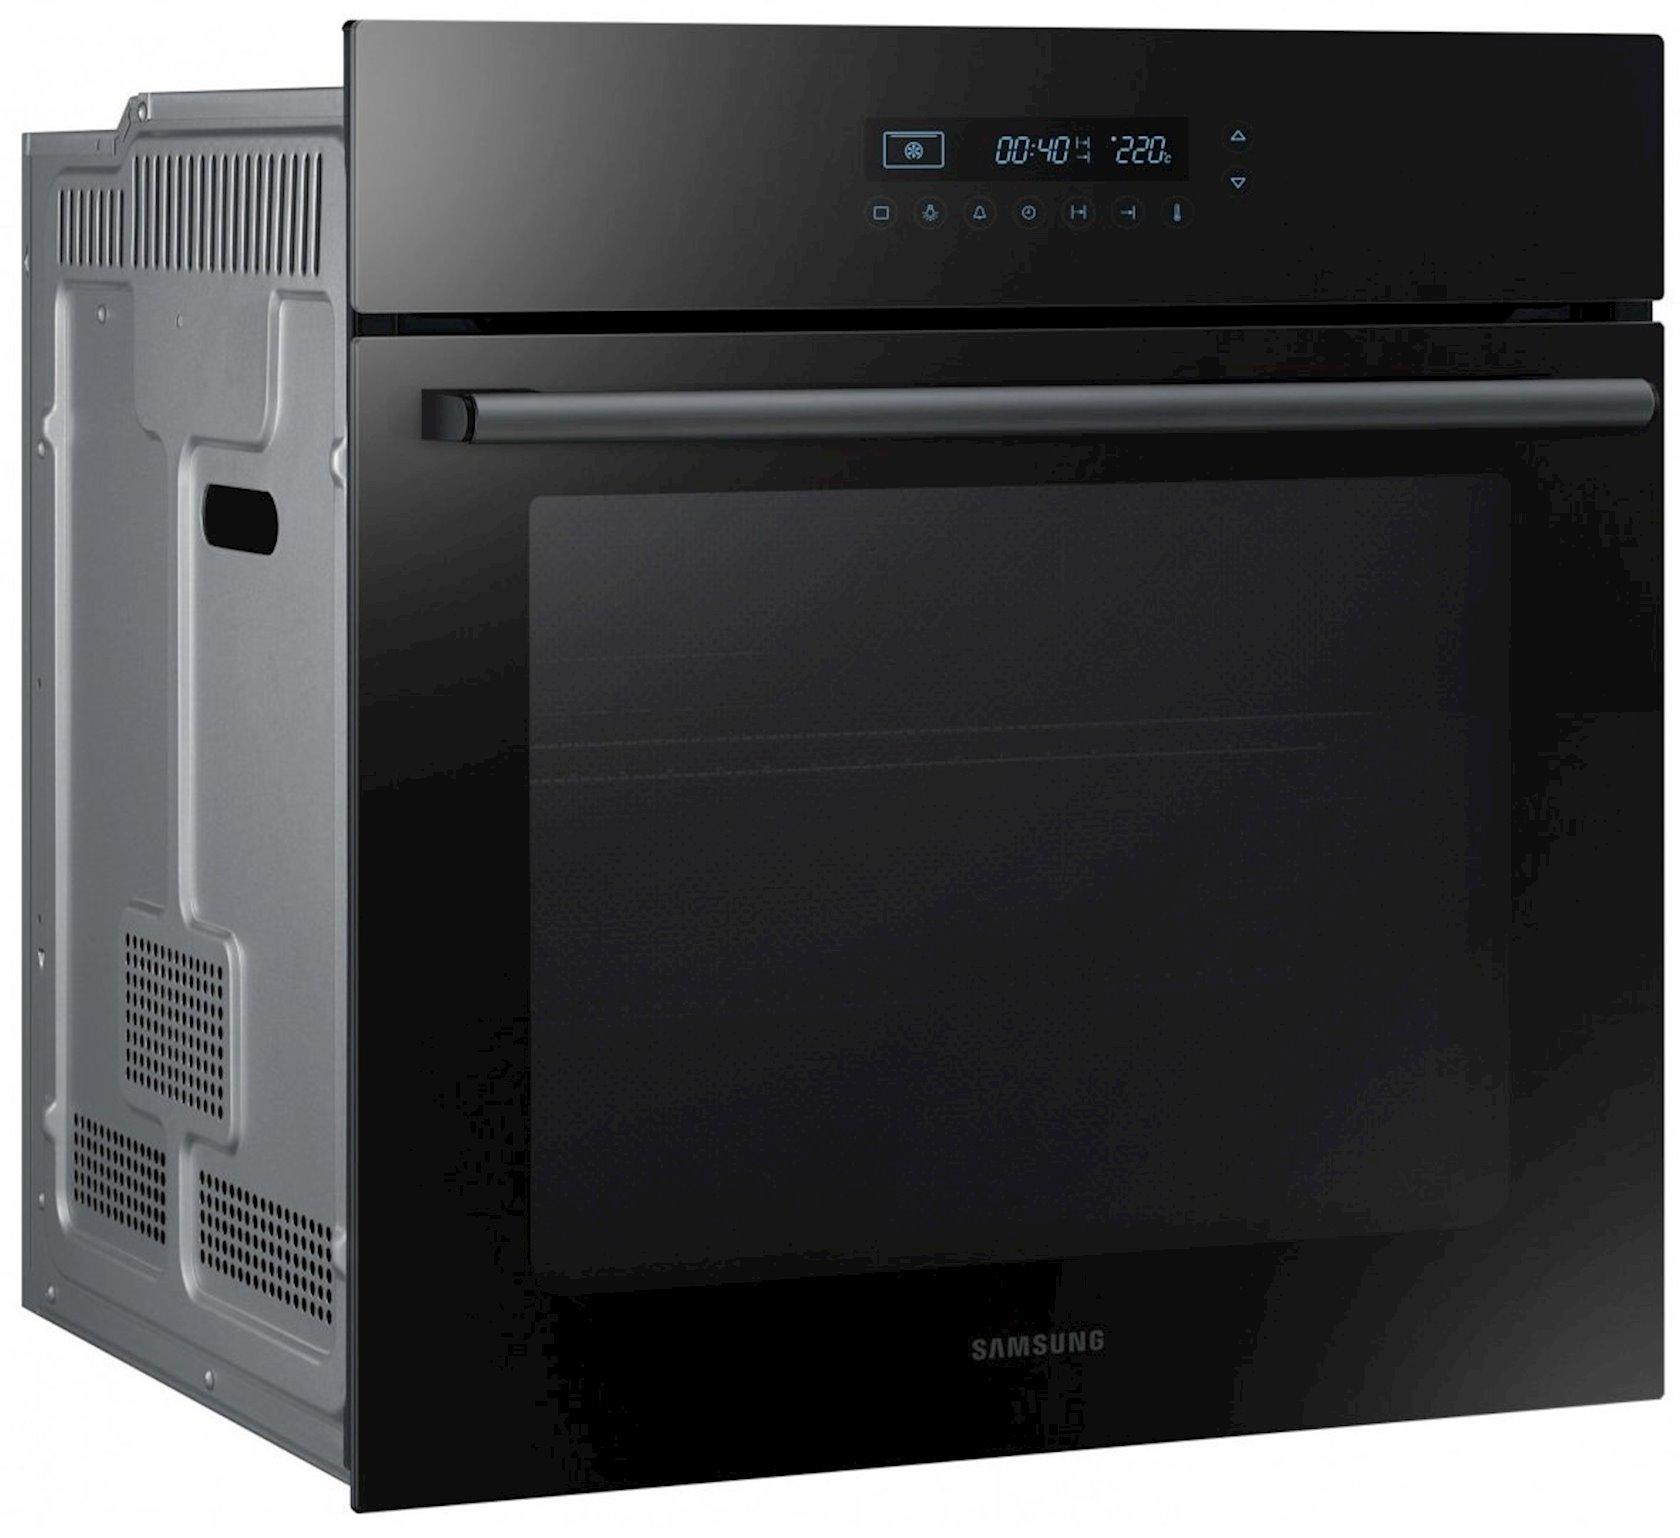 Soba Samsung NV68R5340RB/WT Black